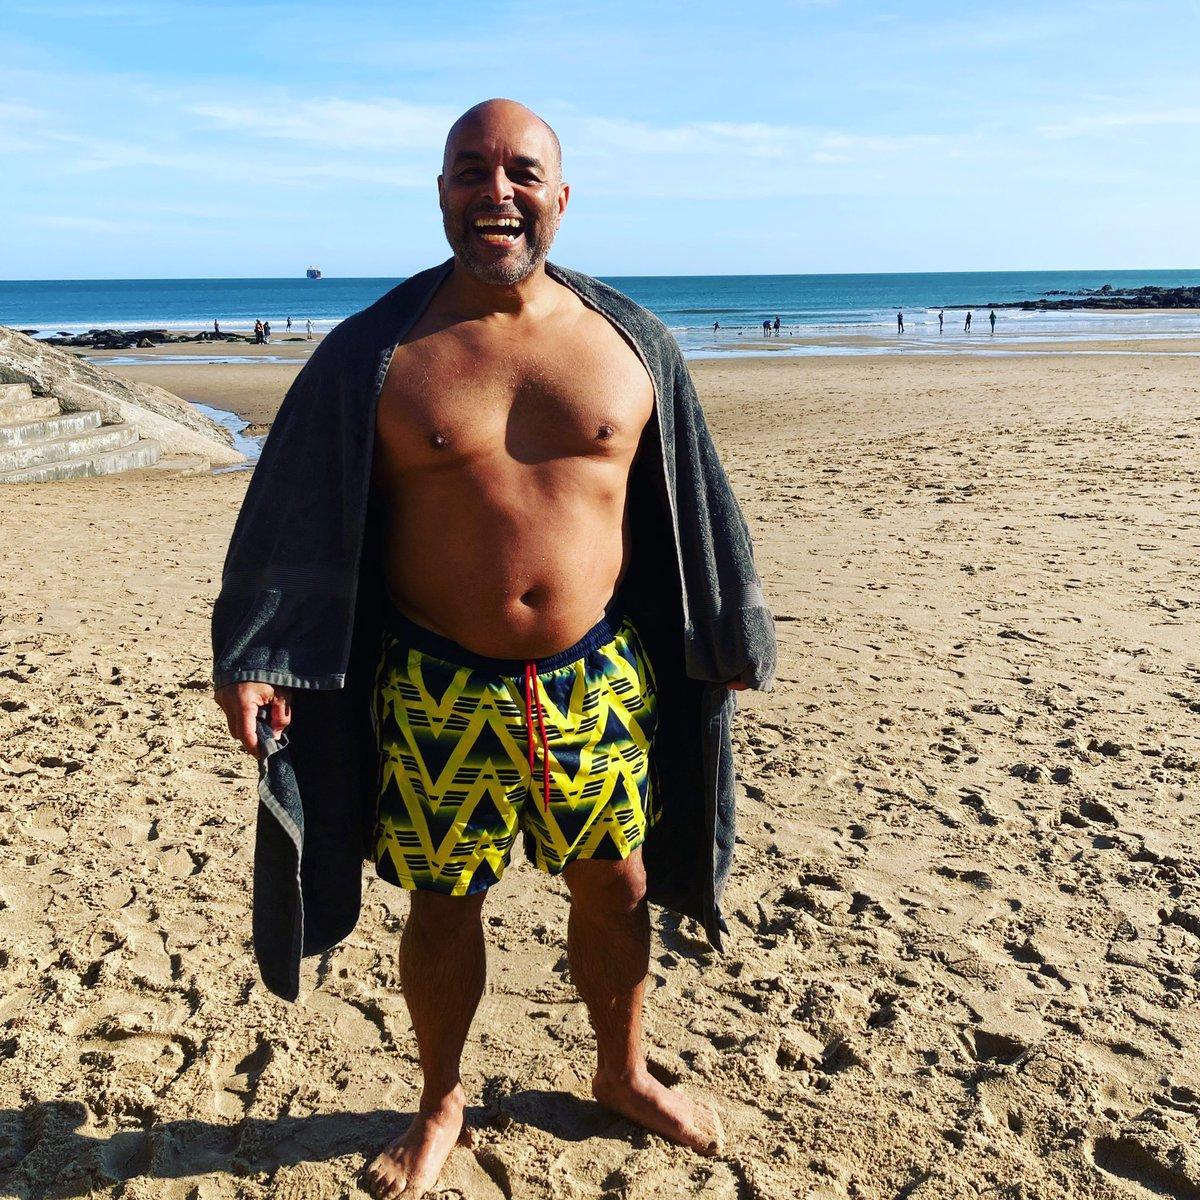 RT @ShovDrumWarrior: Sunday swim in the North Sea GRATEFUL!! 1LOVE 🙏🏾♥️🙏🏾 https://t.co/Z7MZCzcEw9